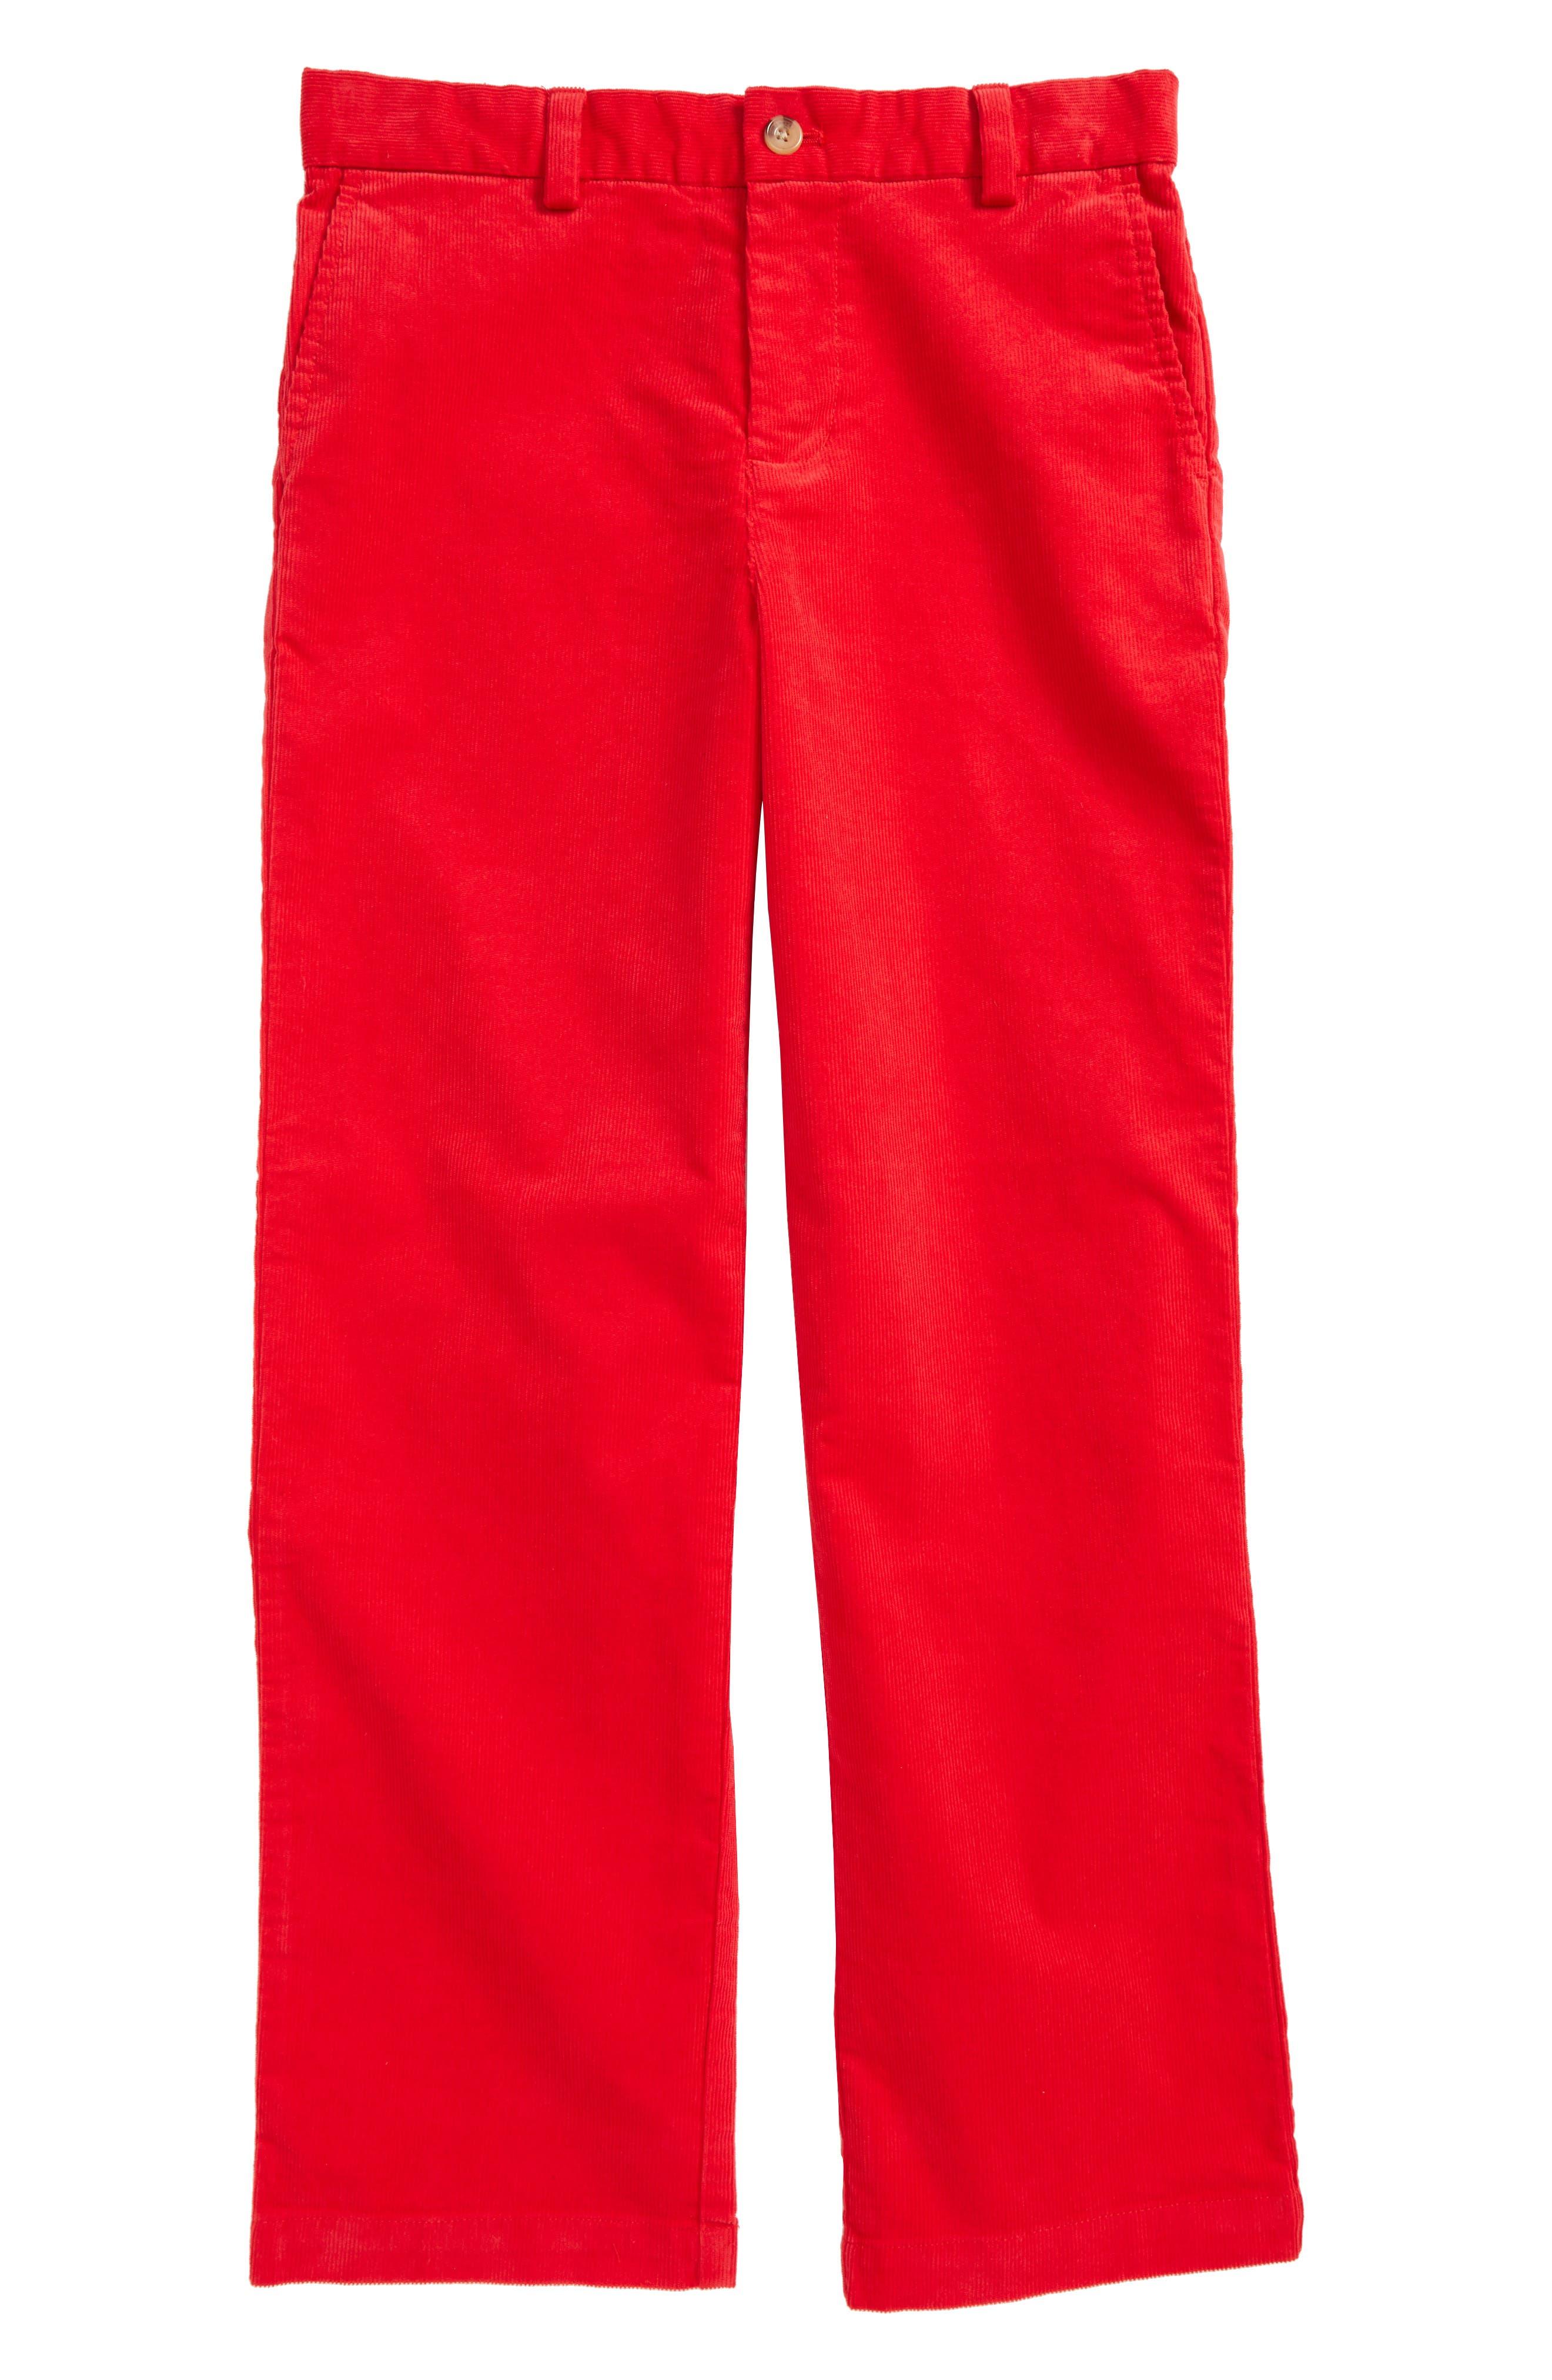 Breaker Corduroy Pants,                             Main thumbnail 1, color,                             Lighthouse Red